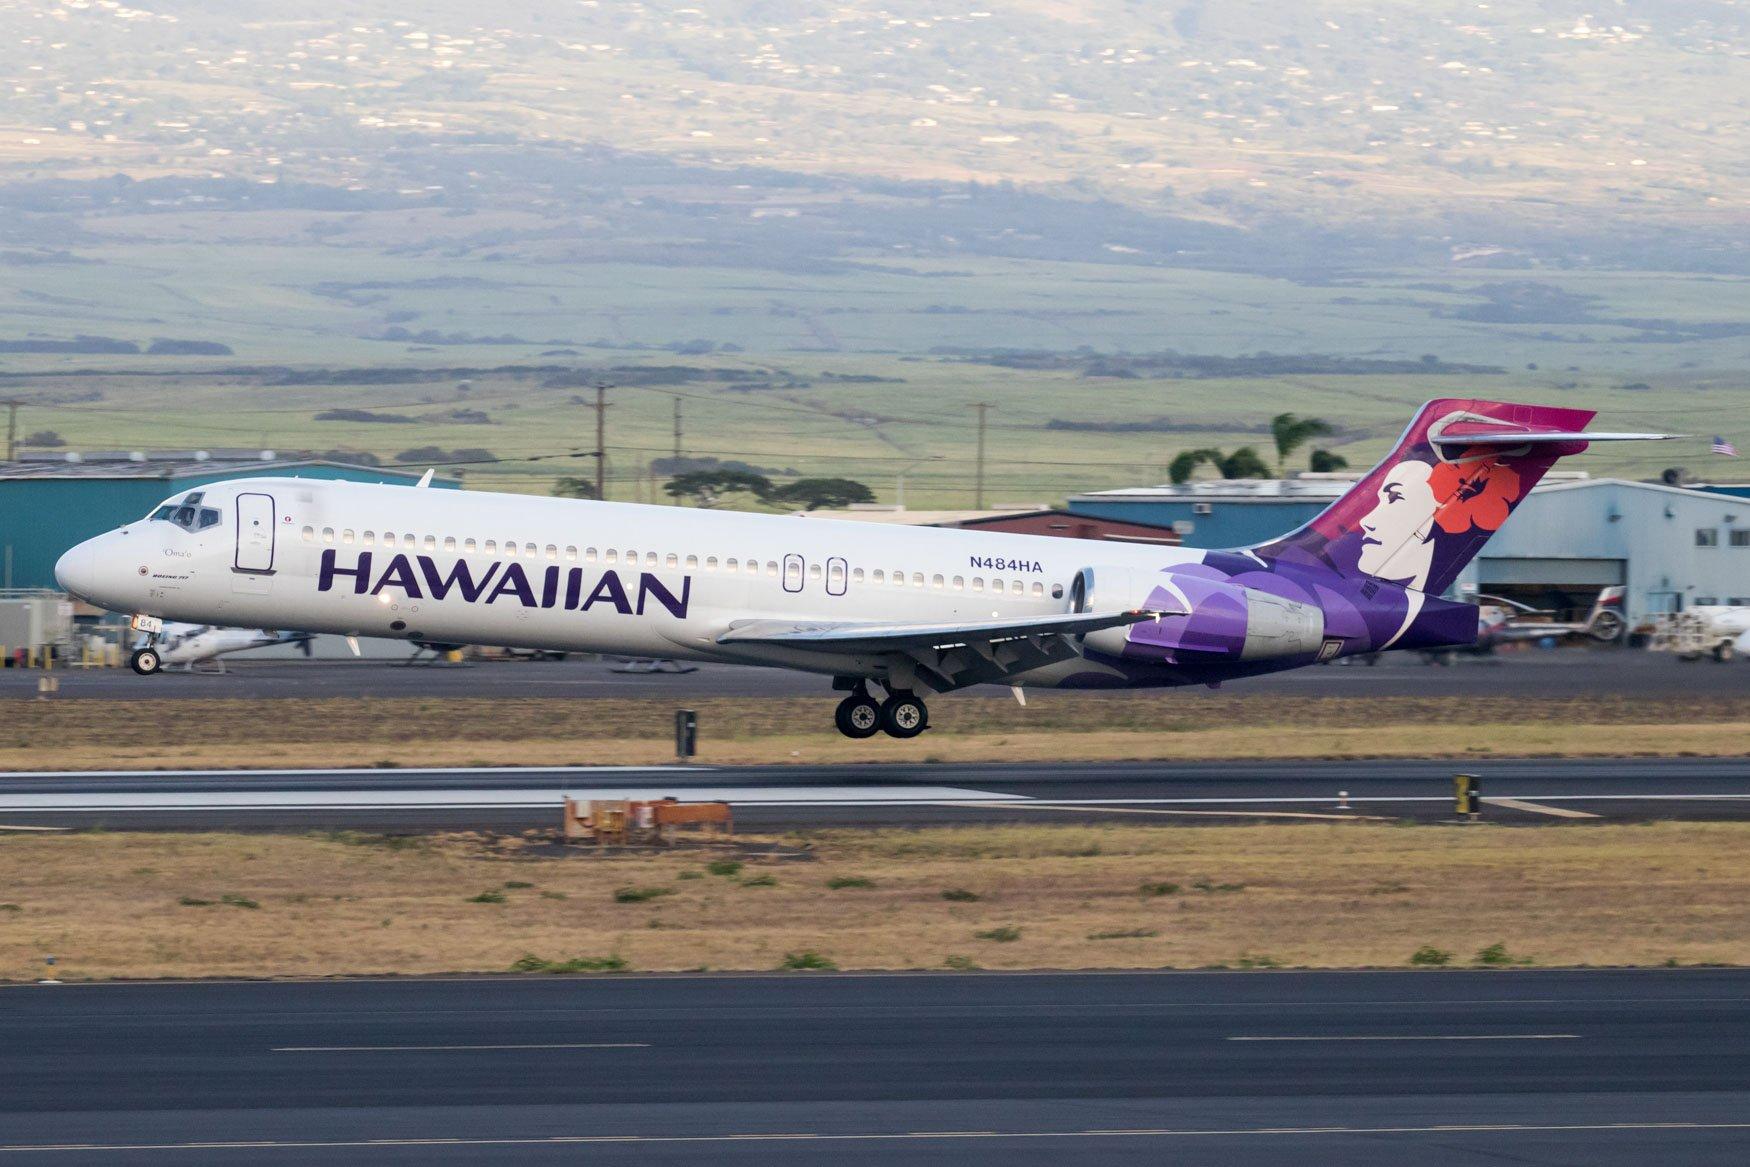 Hawaiian Airlines 717-200 Landing at Kahului